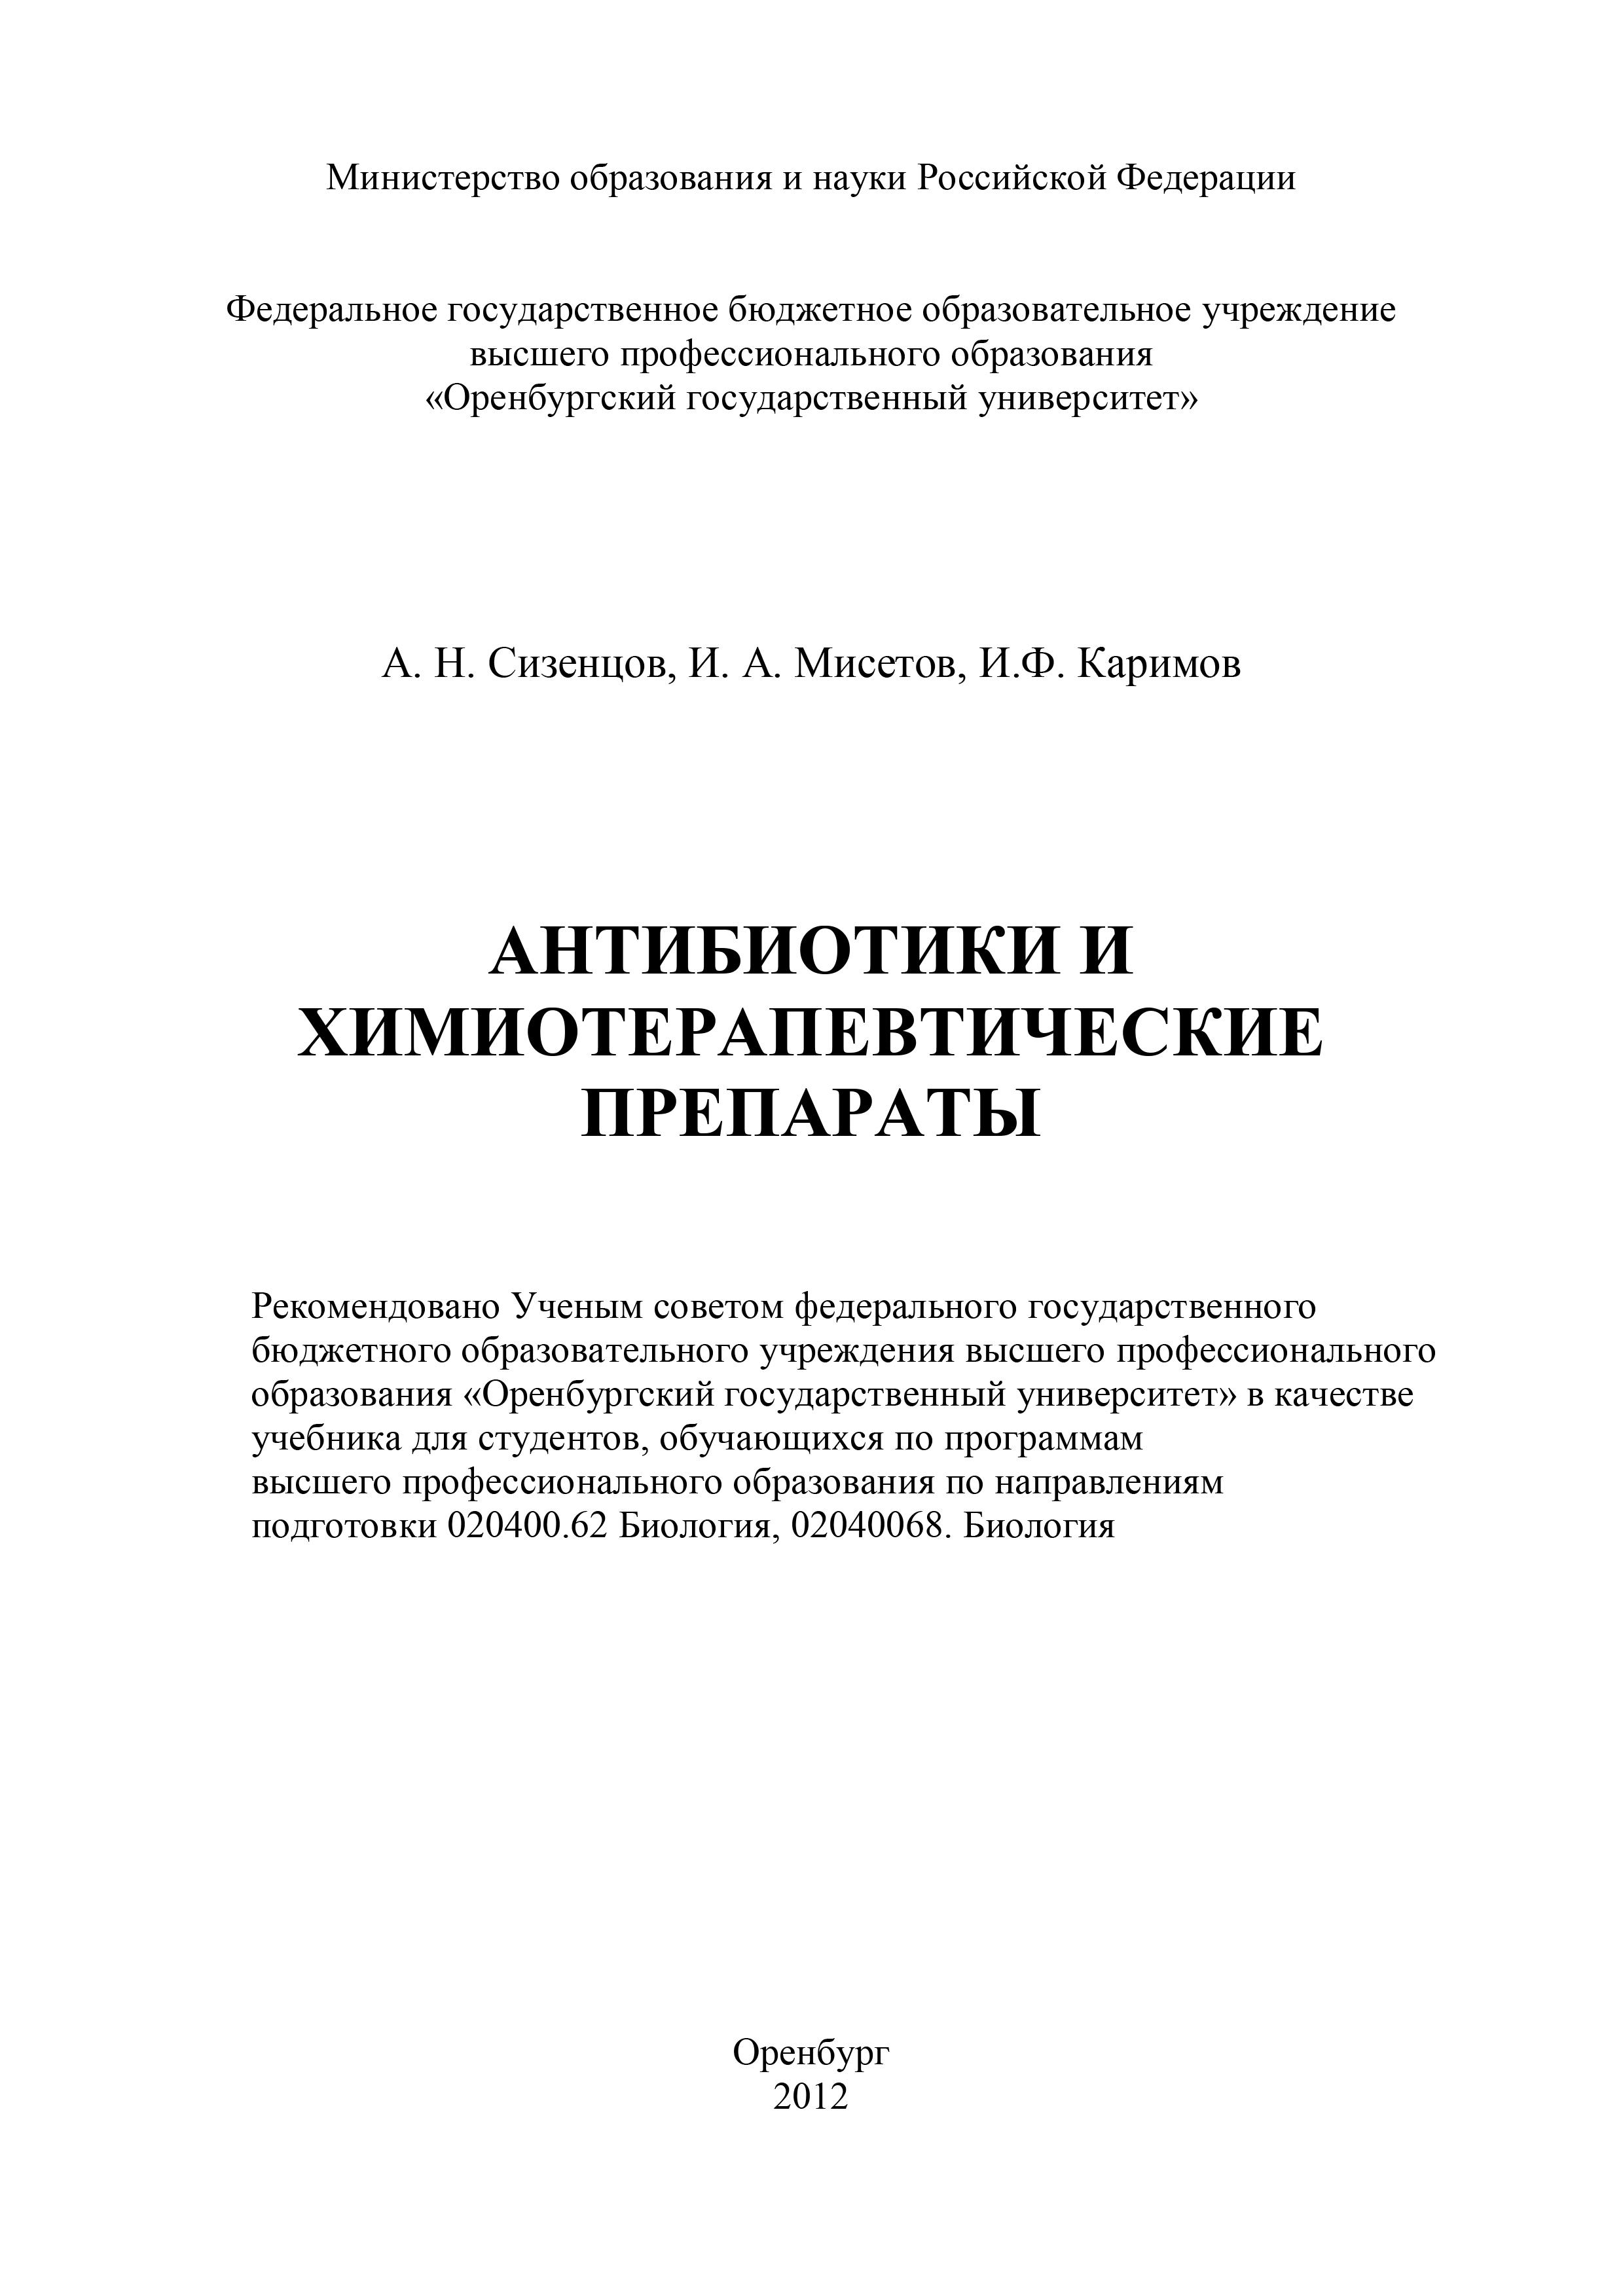 Антибиотики и химиотерапевтические препараты